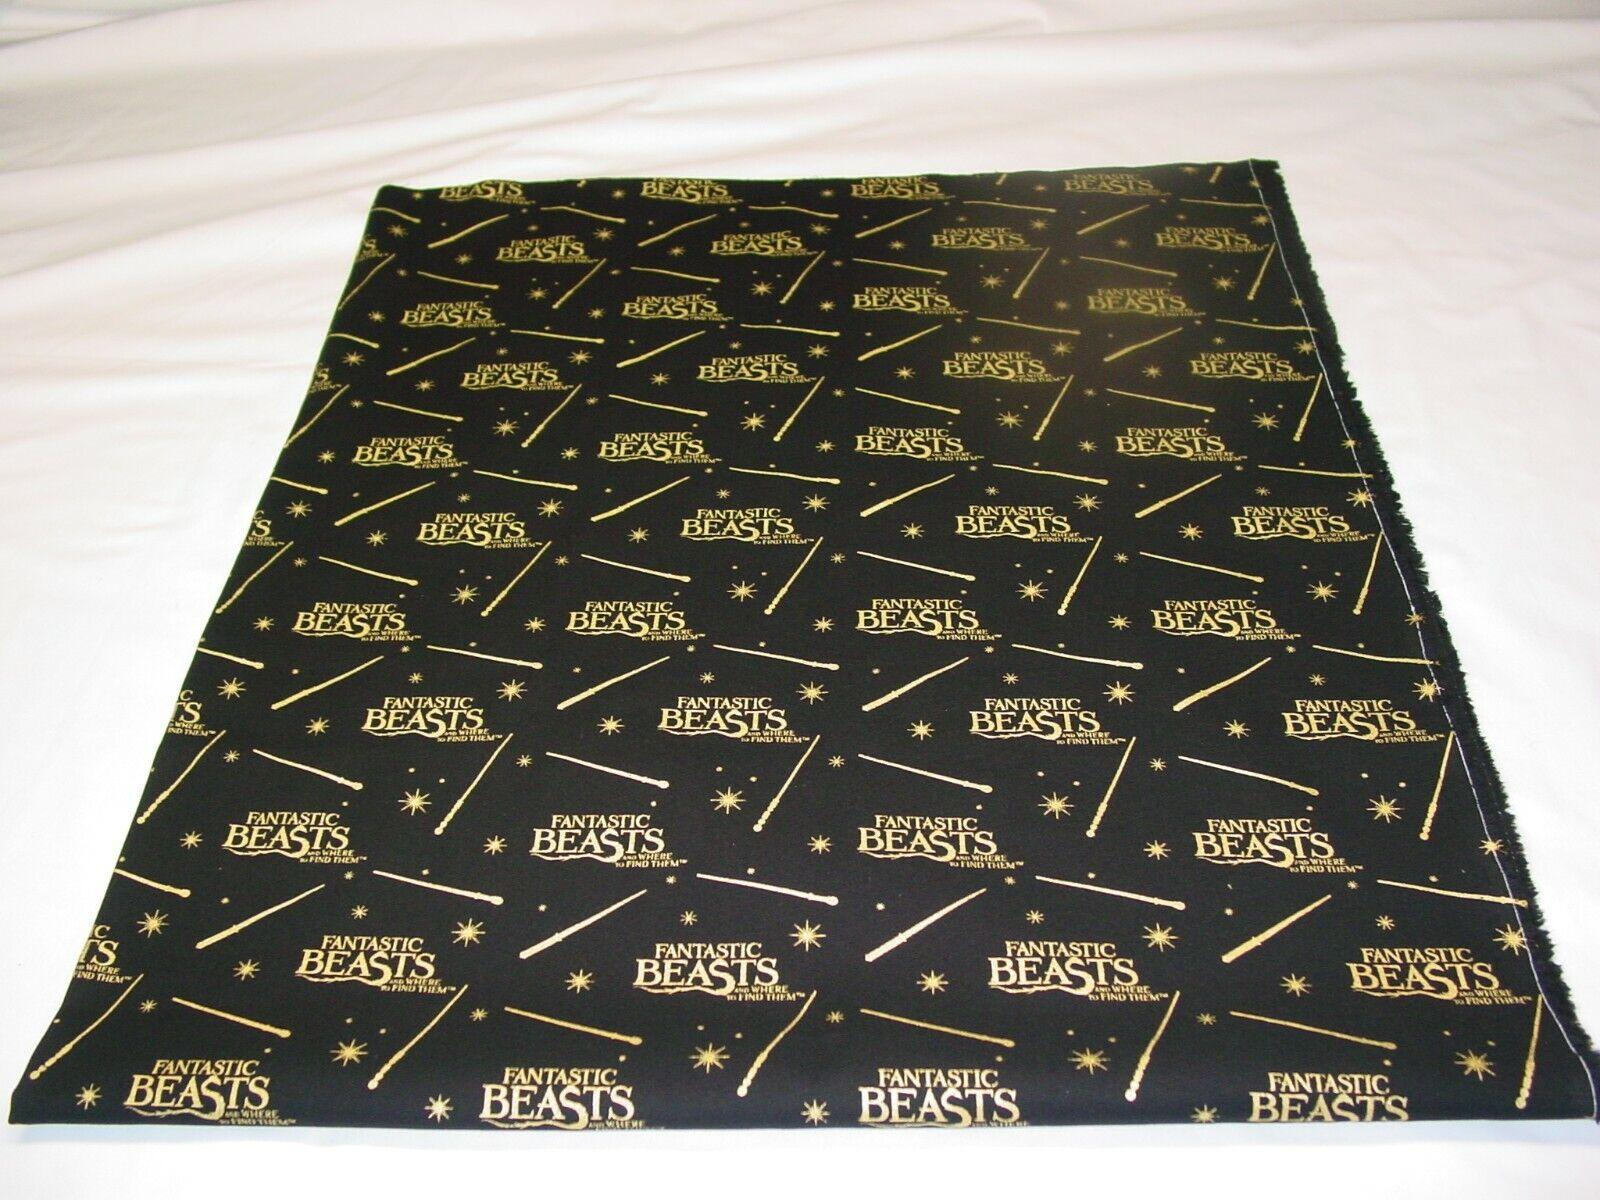 FANTASTIC BEAST BLACK 100 COTTON FABRIC REMNANT LENGTH 35 X WIDTH 43  - $10.50